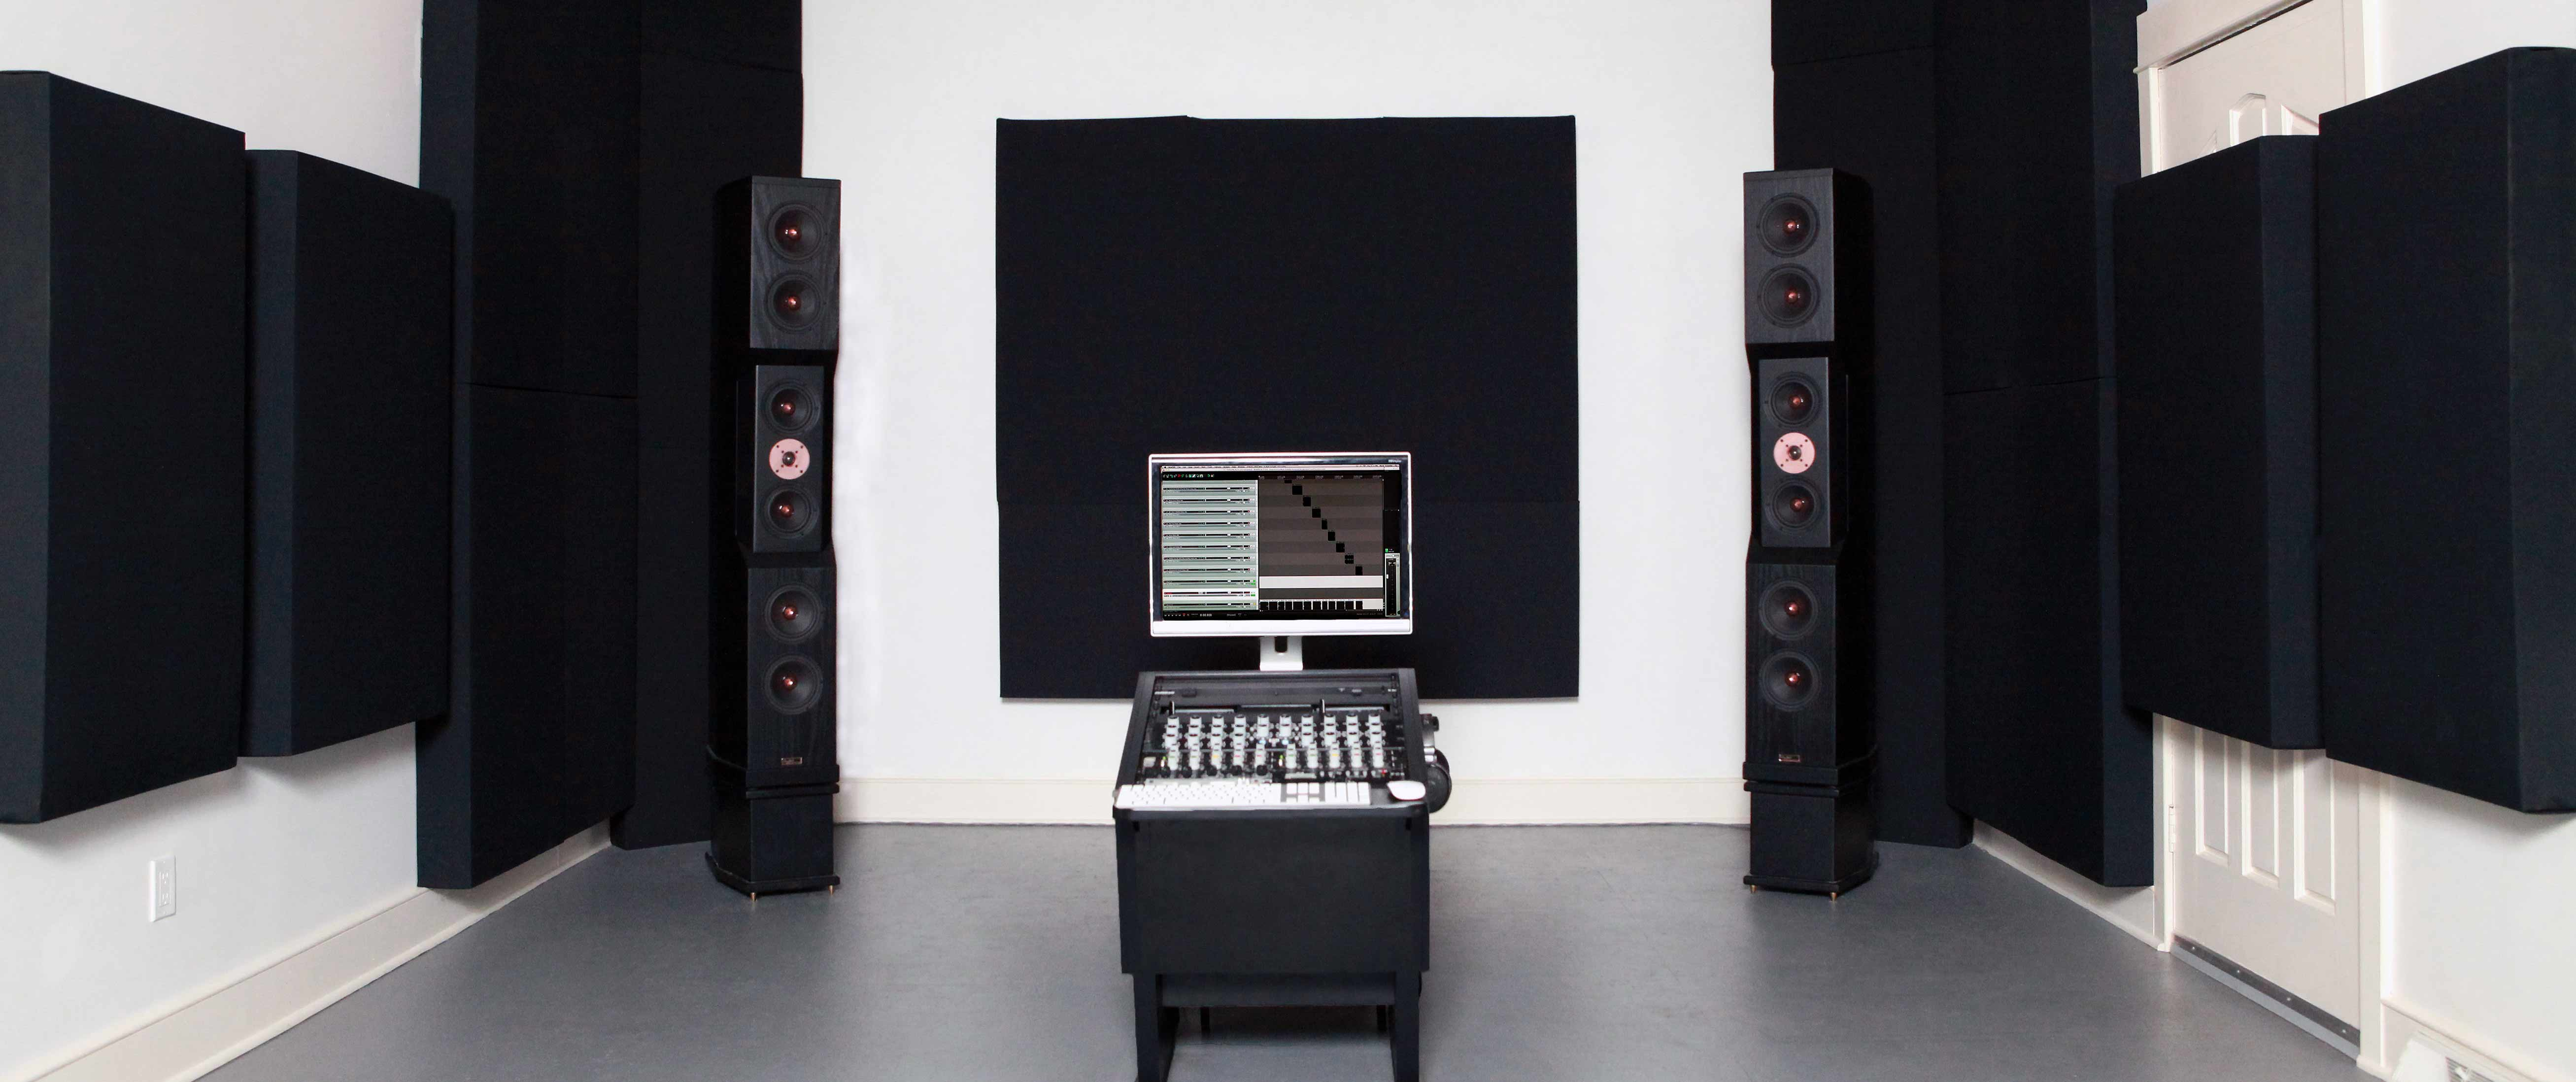 Full Circle Mastering - Analog and Digital Mastering Studio